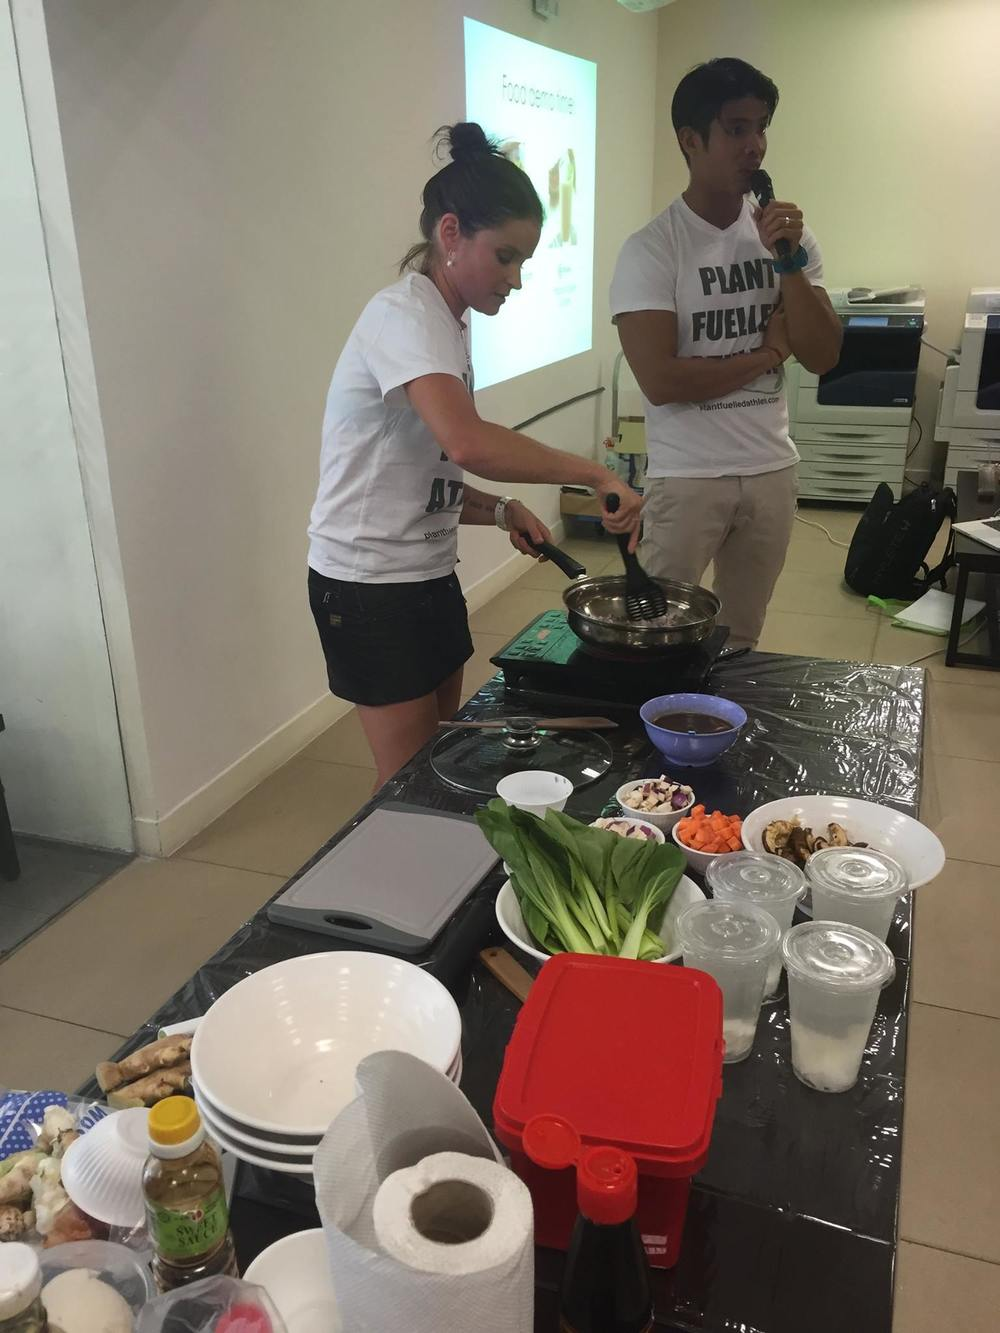 Cooking workshop at James Cook University